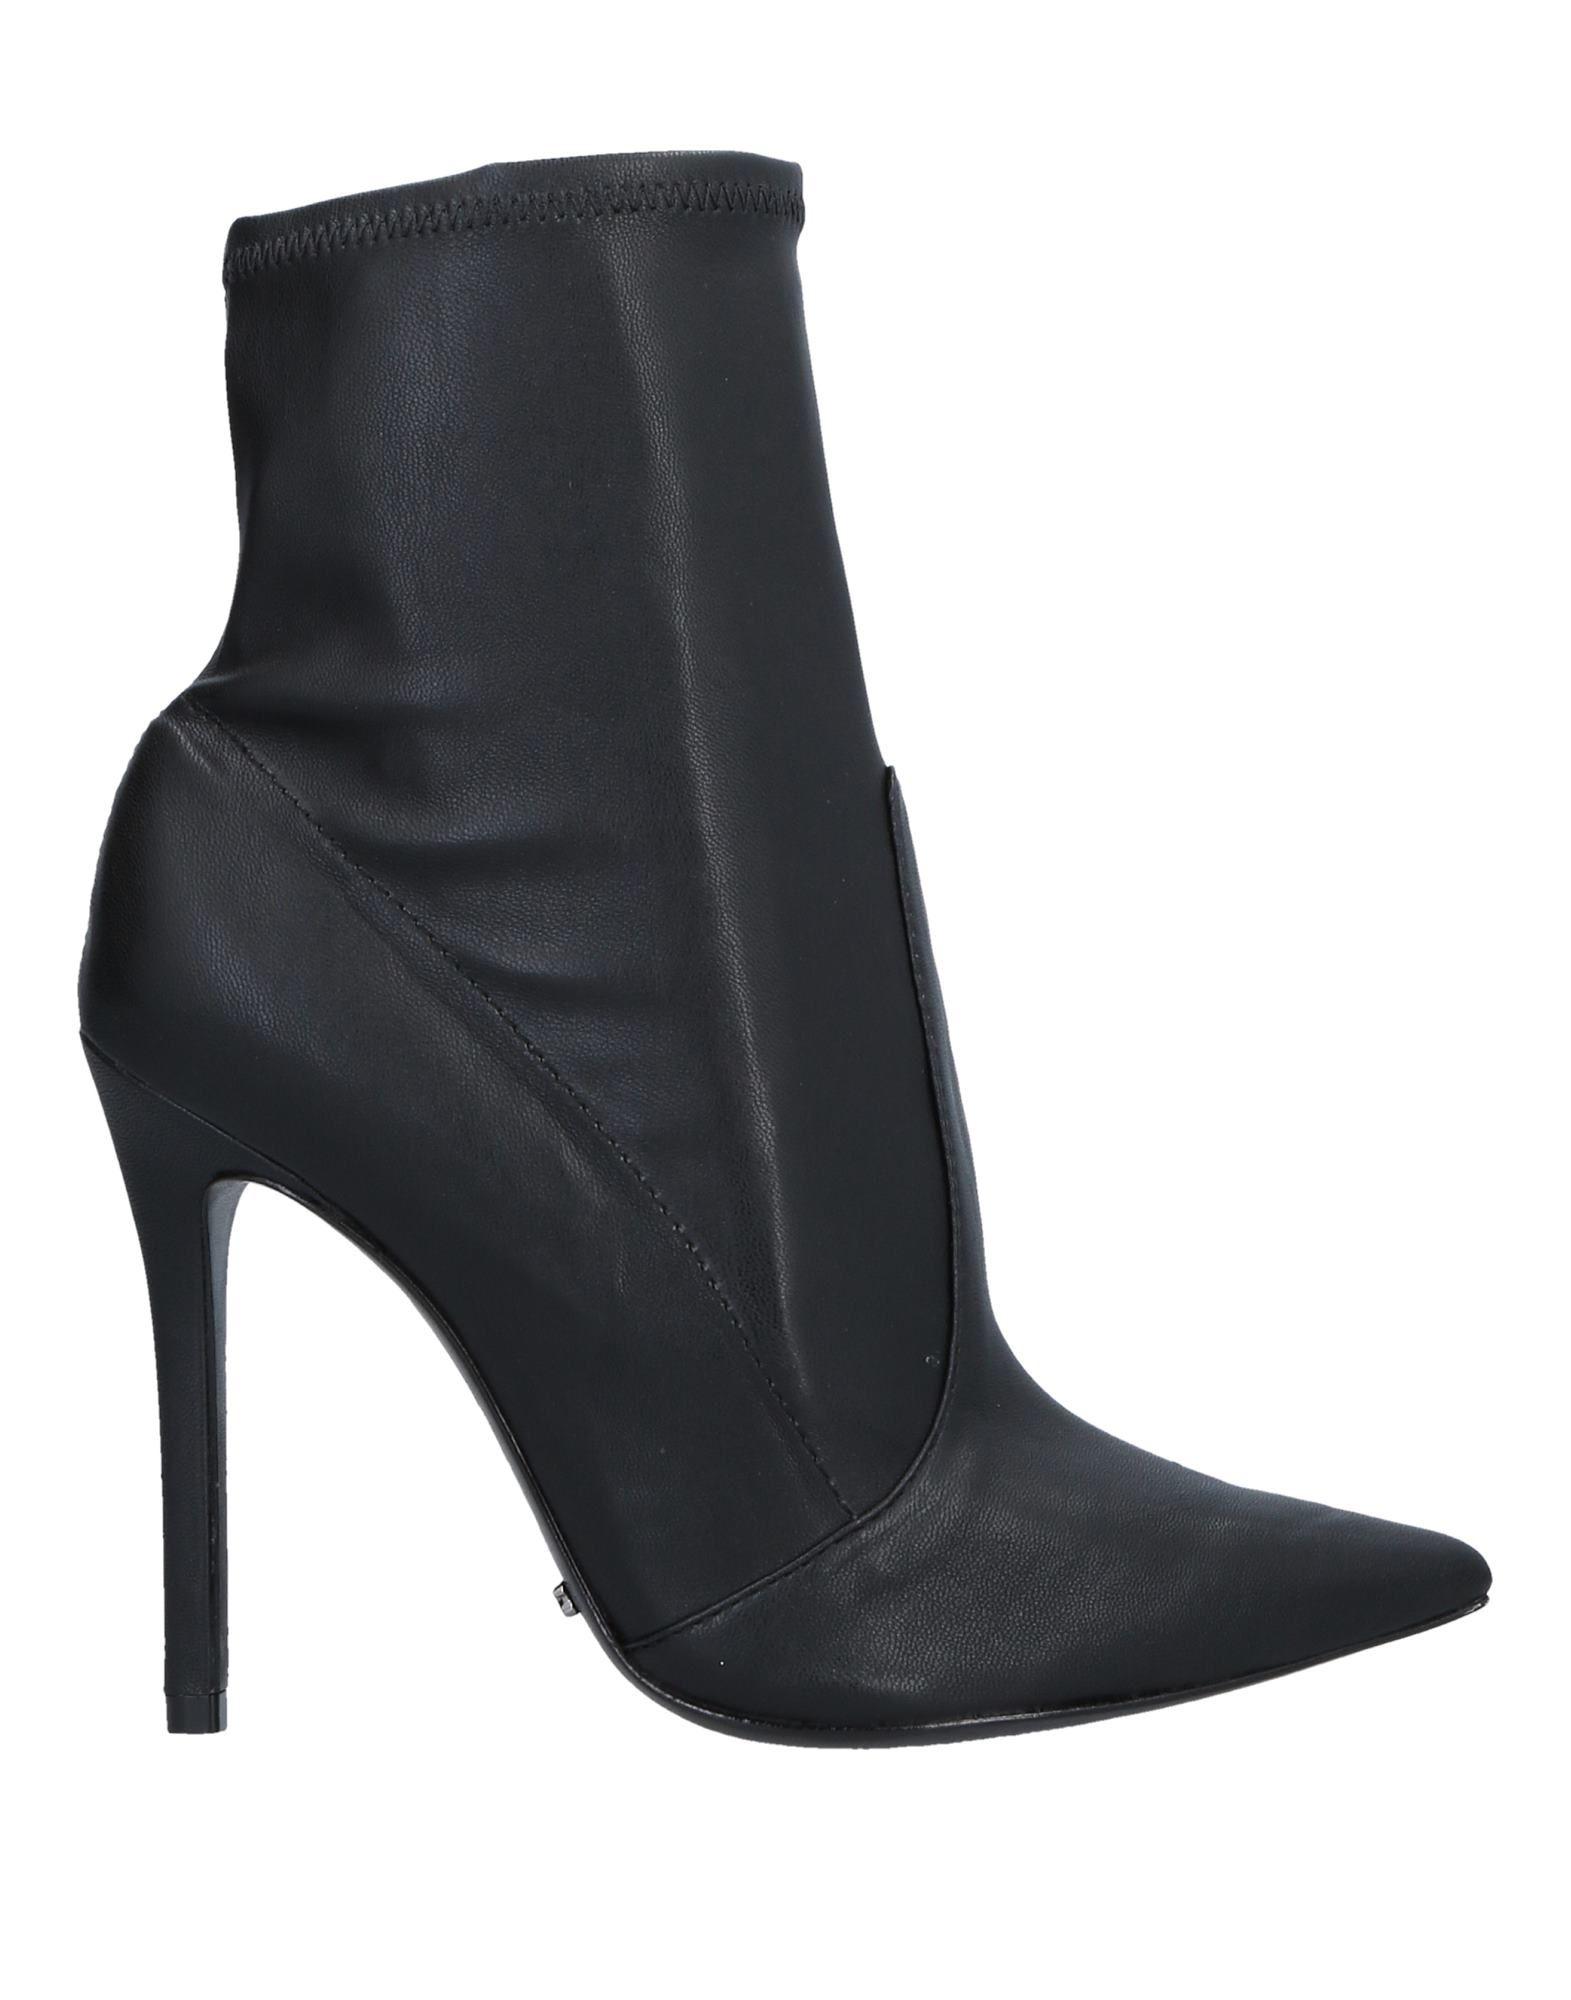 Schutz Ankle Ankle Boot - Women Schutz Ankle Ankle Boots online on  Australia - 11517835EA e5b88e